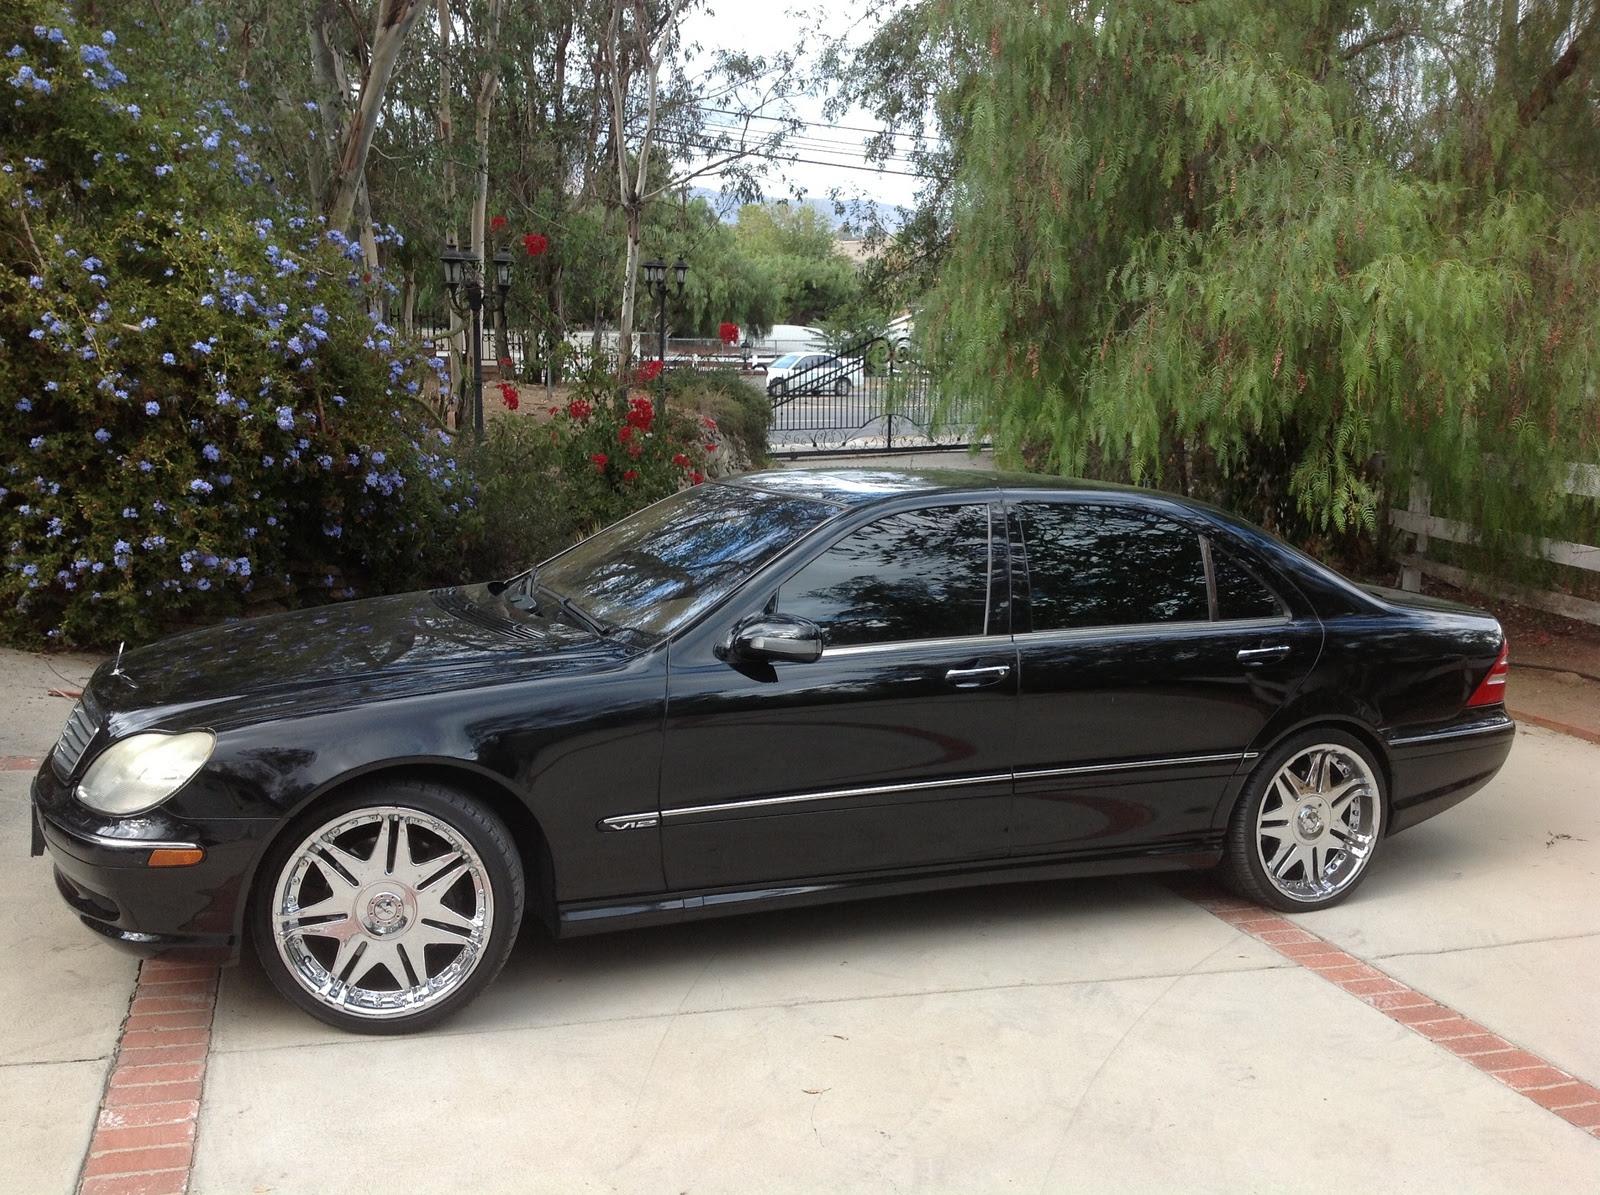 2002 Mercedes-Benz S-Class - Pictures - CarGurus